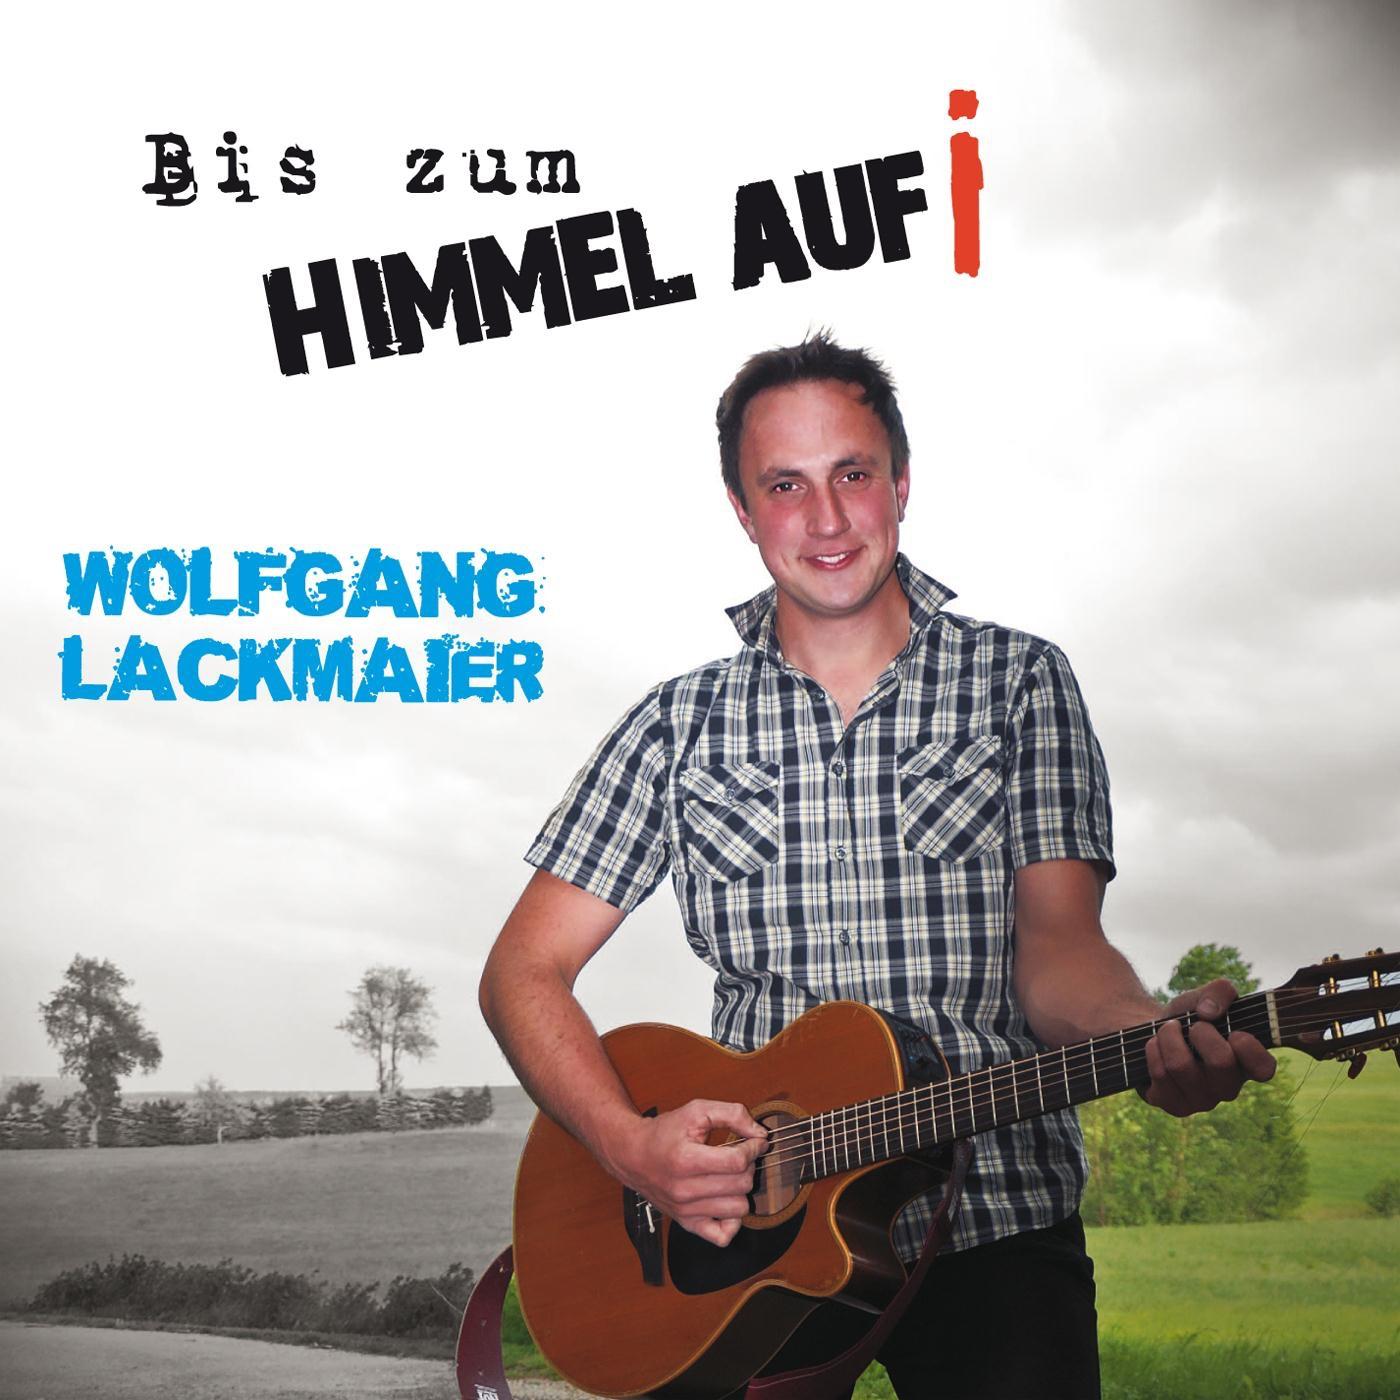 Bis zum Himmel aufi (Acoustic Version)